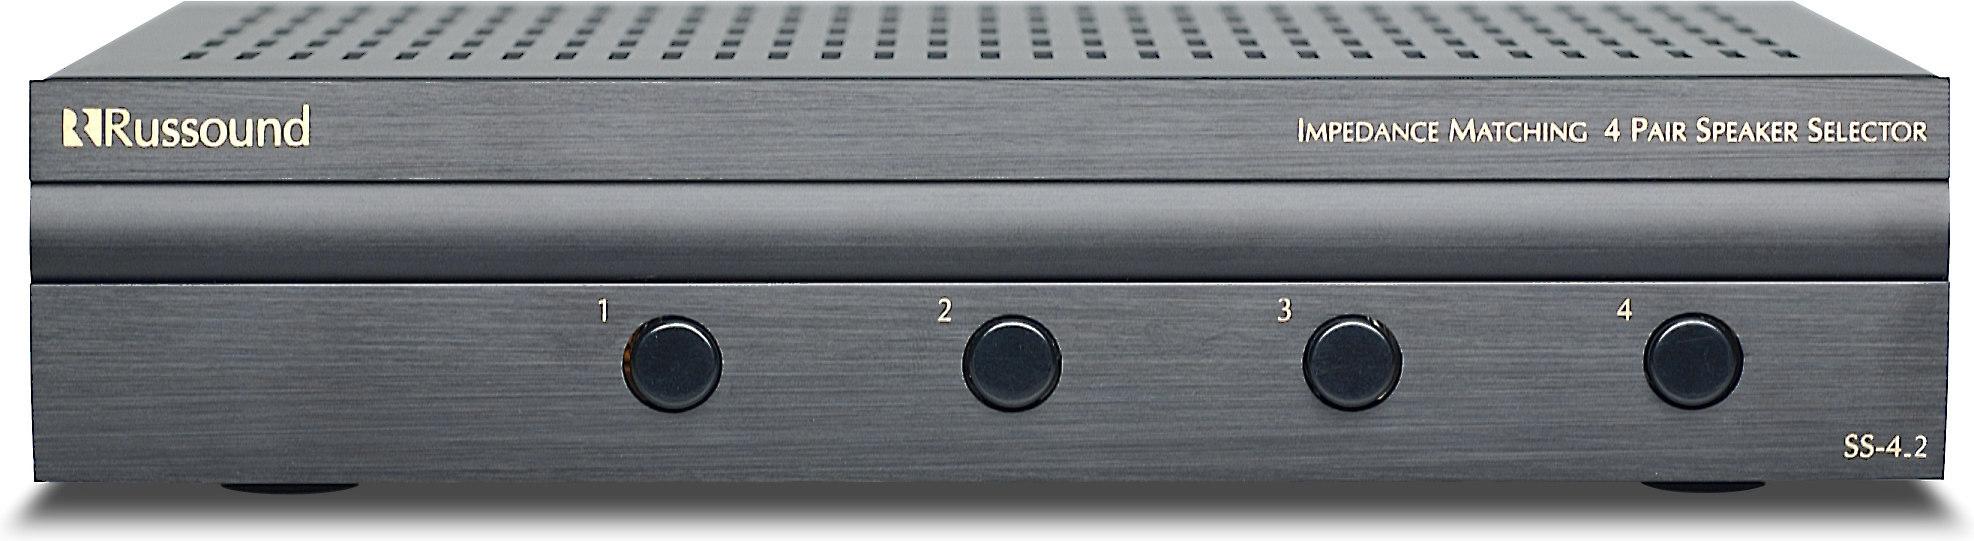 Russound SS-10.10 10-pair speaker selector at Crutchfield